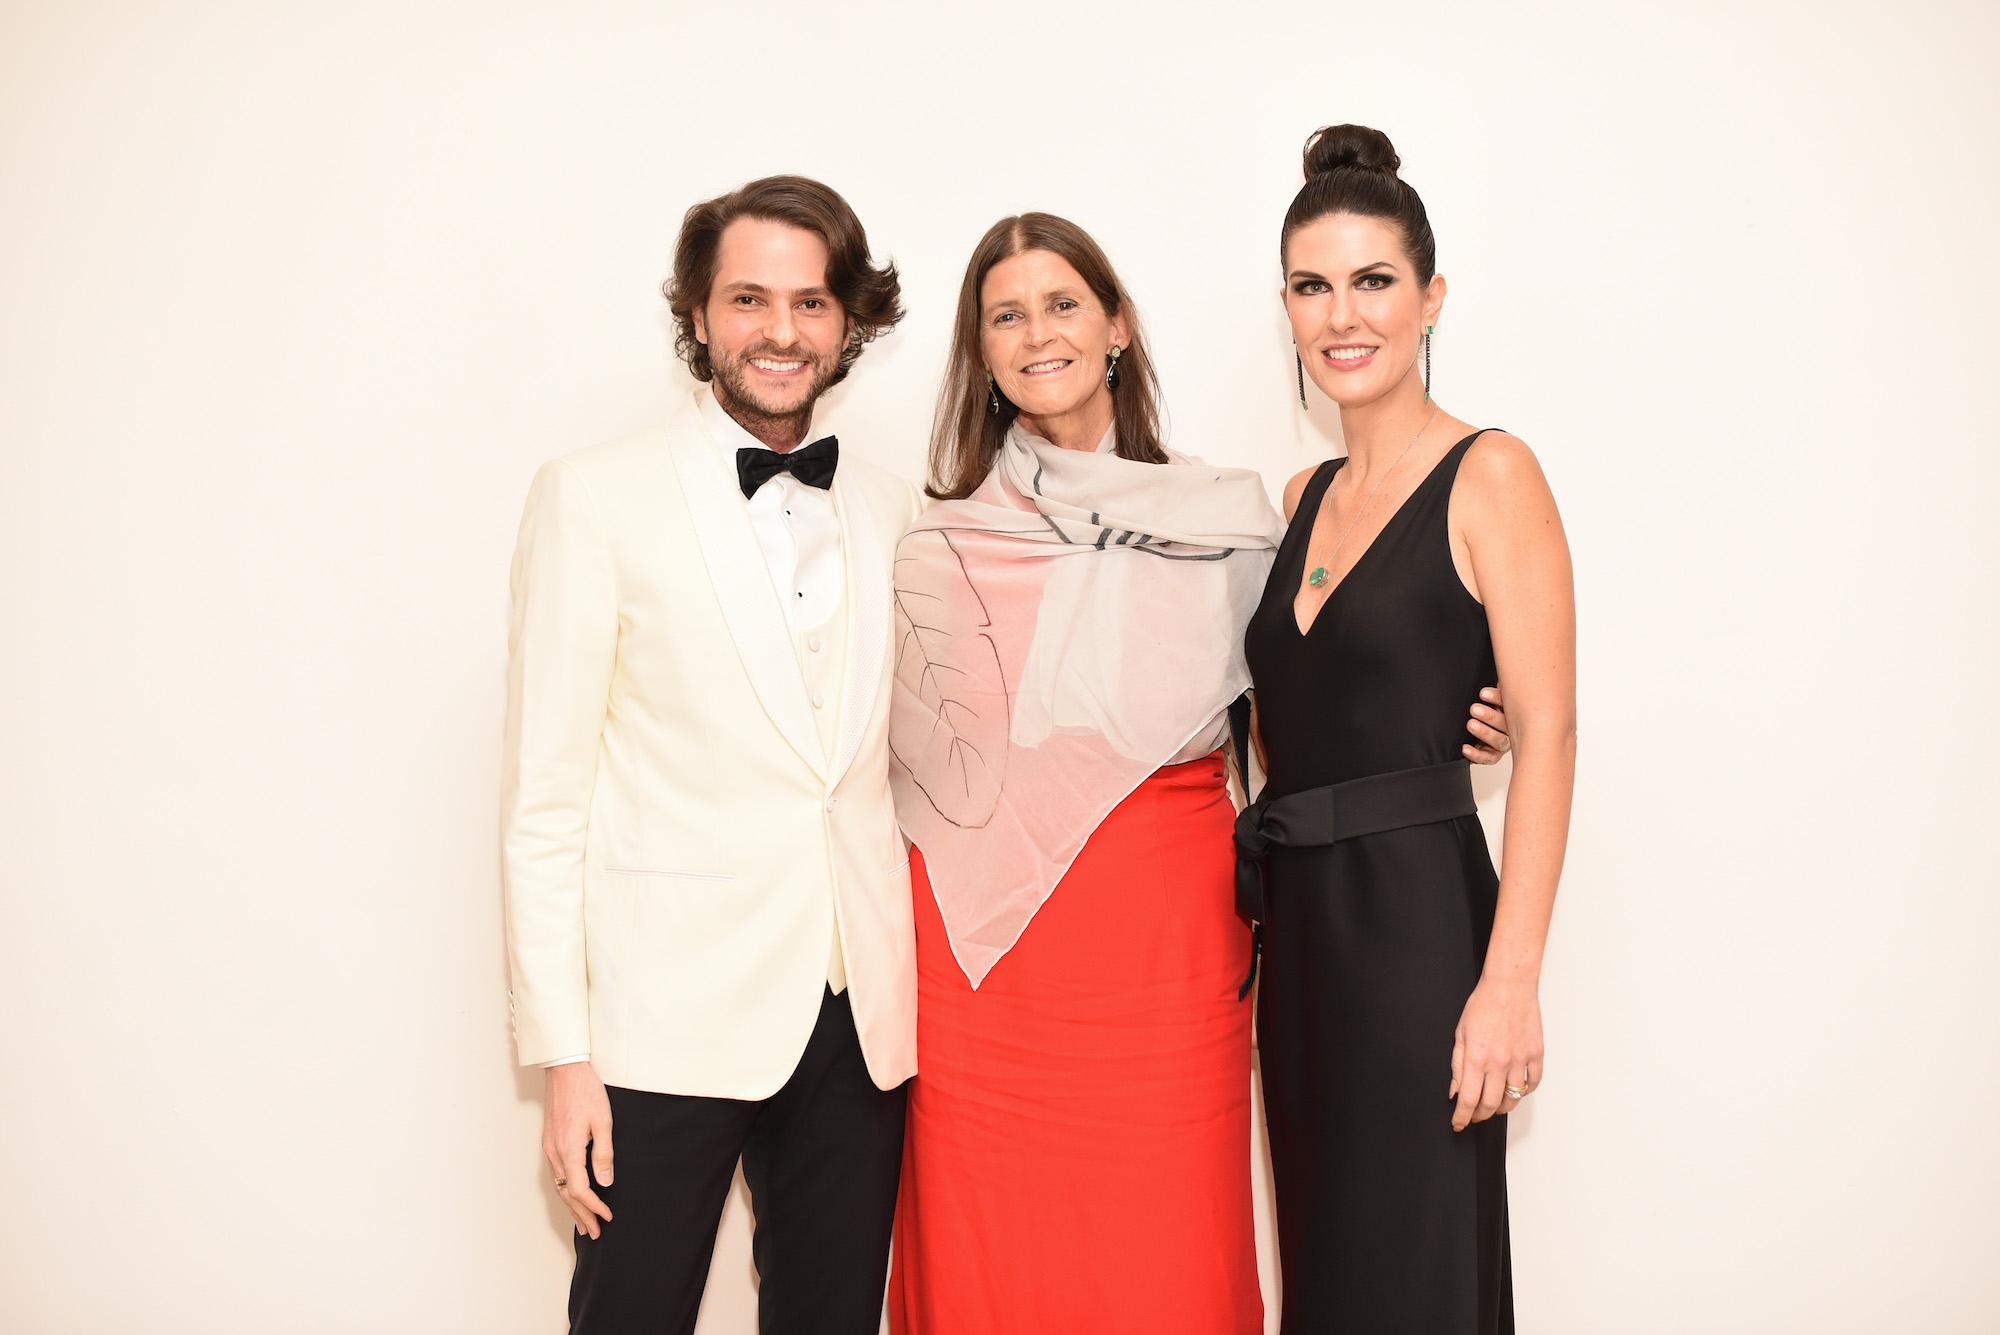 Michel Saflatle, Tarsila do Amaral e Andrea Bartelle V BrazilFoundation Gala São Paulo Chanel 2018 Filantropia Brasil Philanthropy Brazil